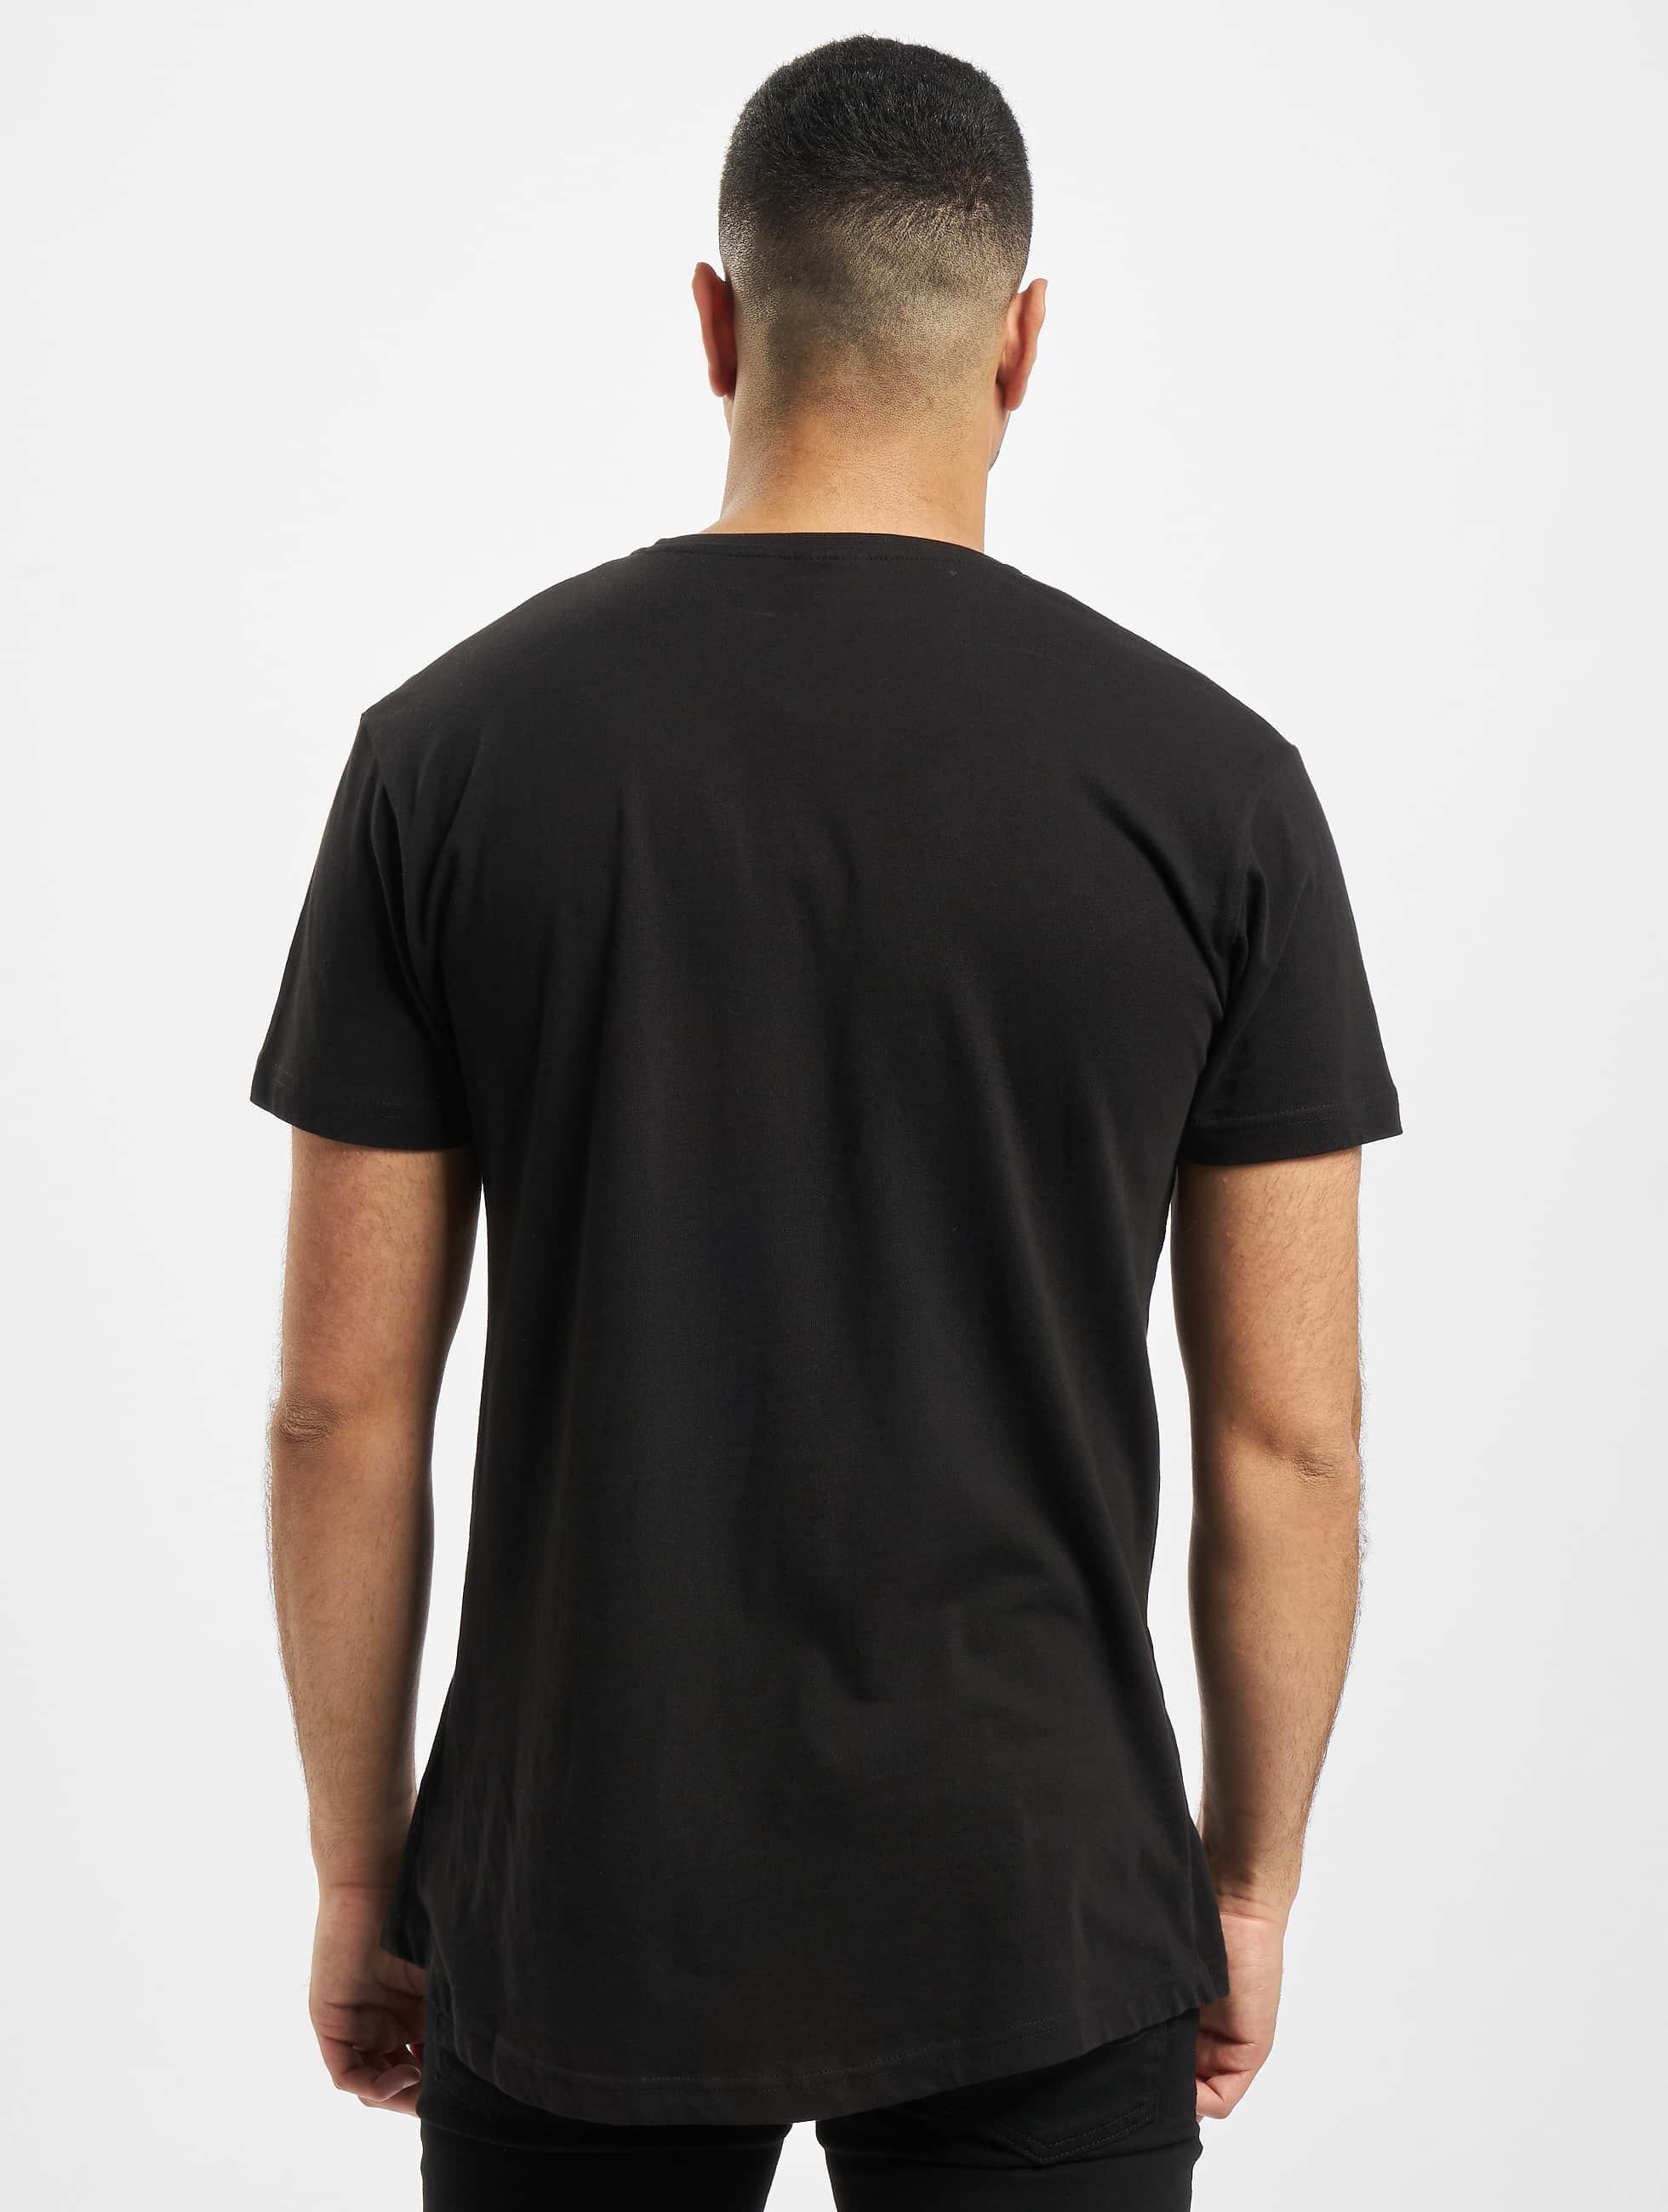 Urban Classics Tall Tees Shaped Long schwarz